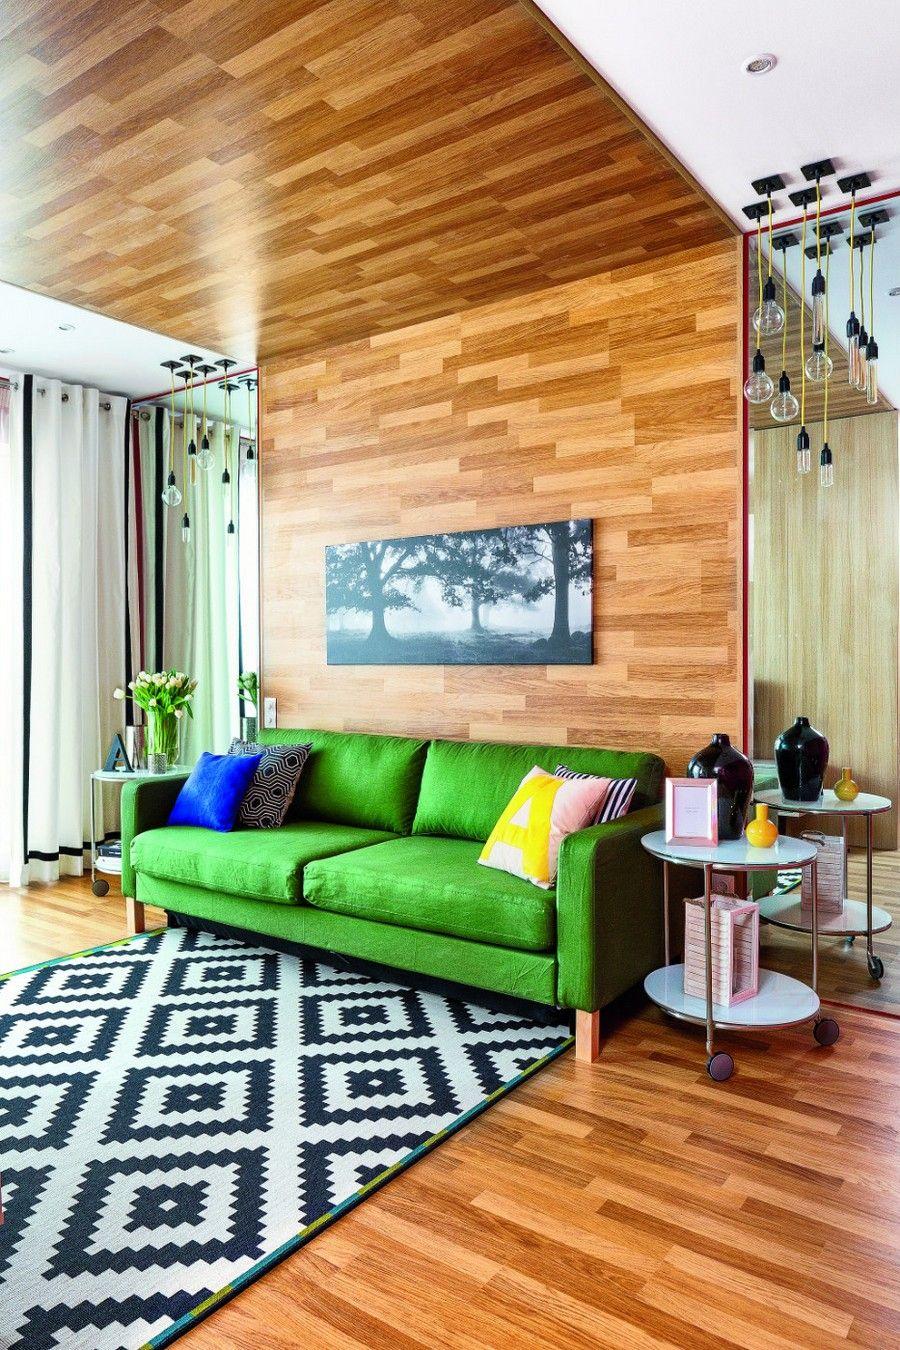 Wooden Ceiling Décor 20 Unhackneyed Ideas (Part 1